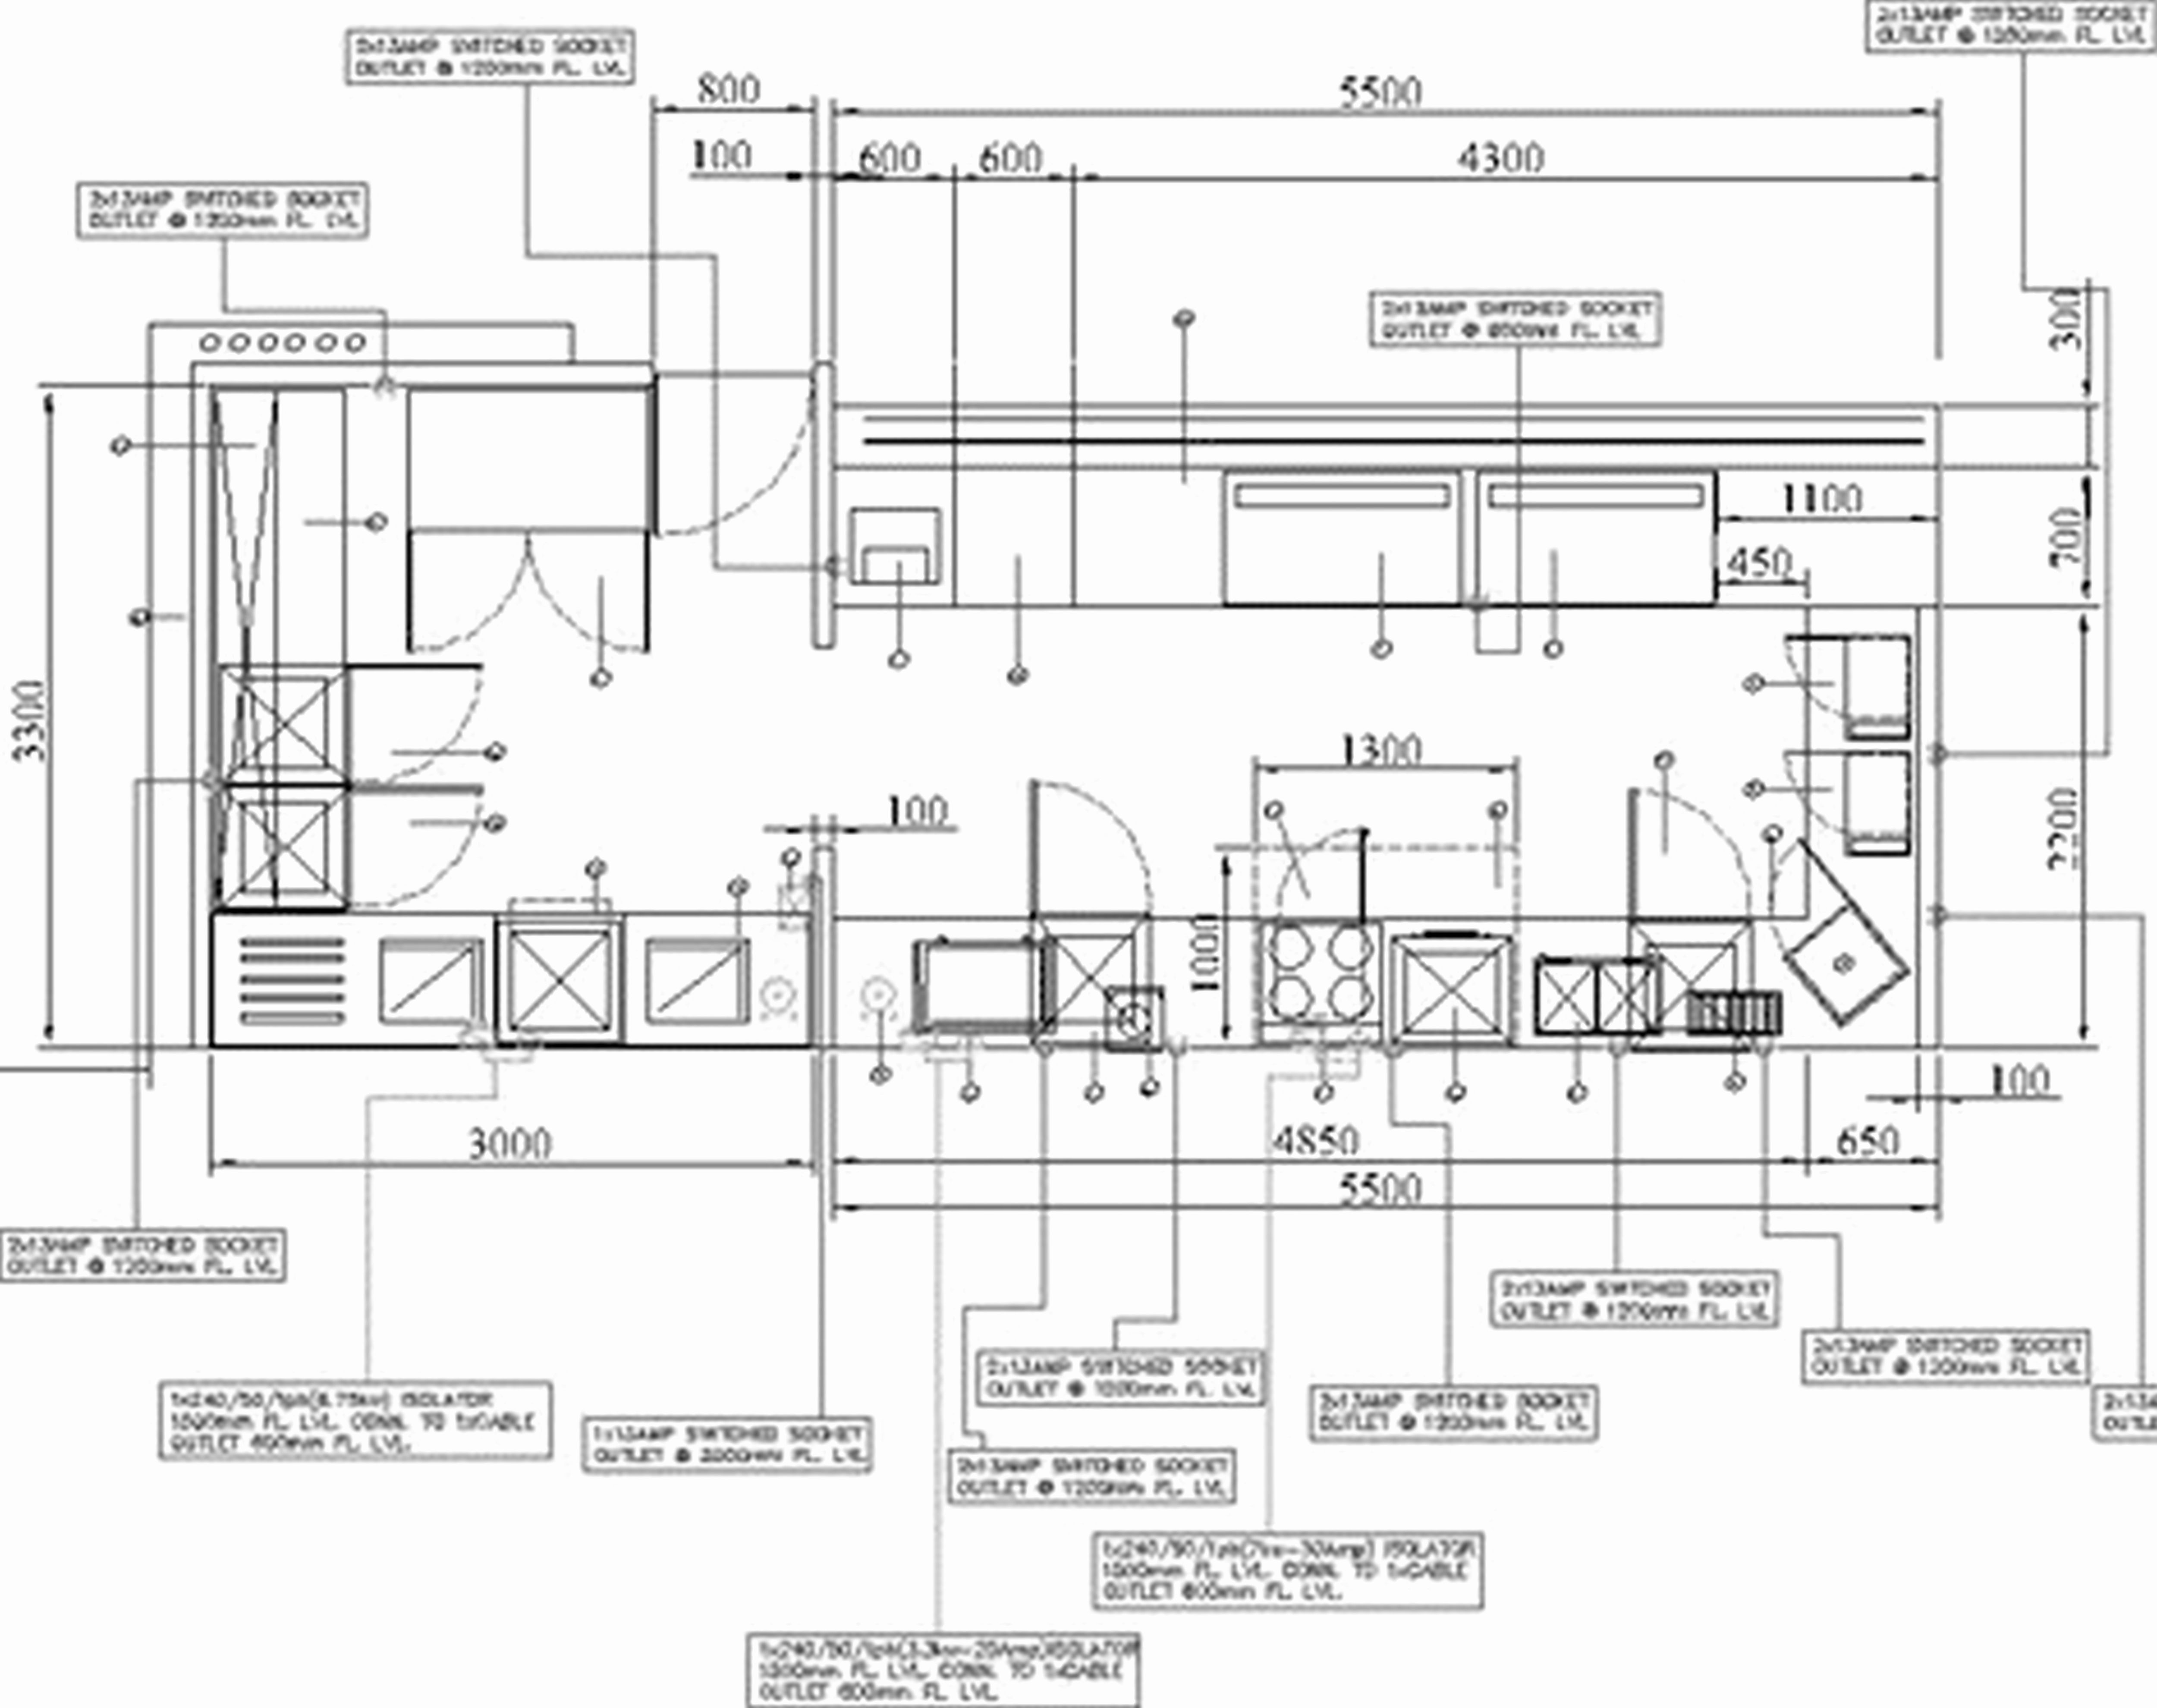 restaurant floor plans with dimensions kitchen commercial kitchen design layouts modern floor plan [ 5000 x 3960 Pixel ]